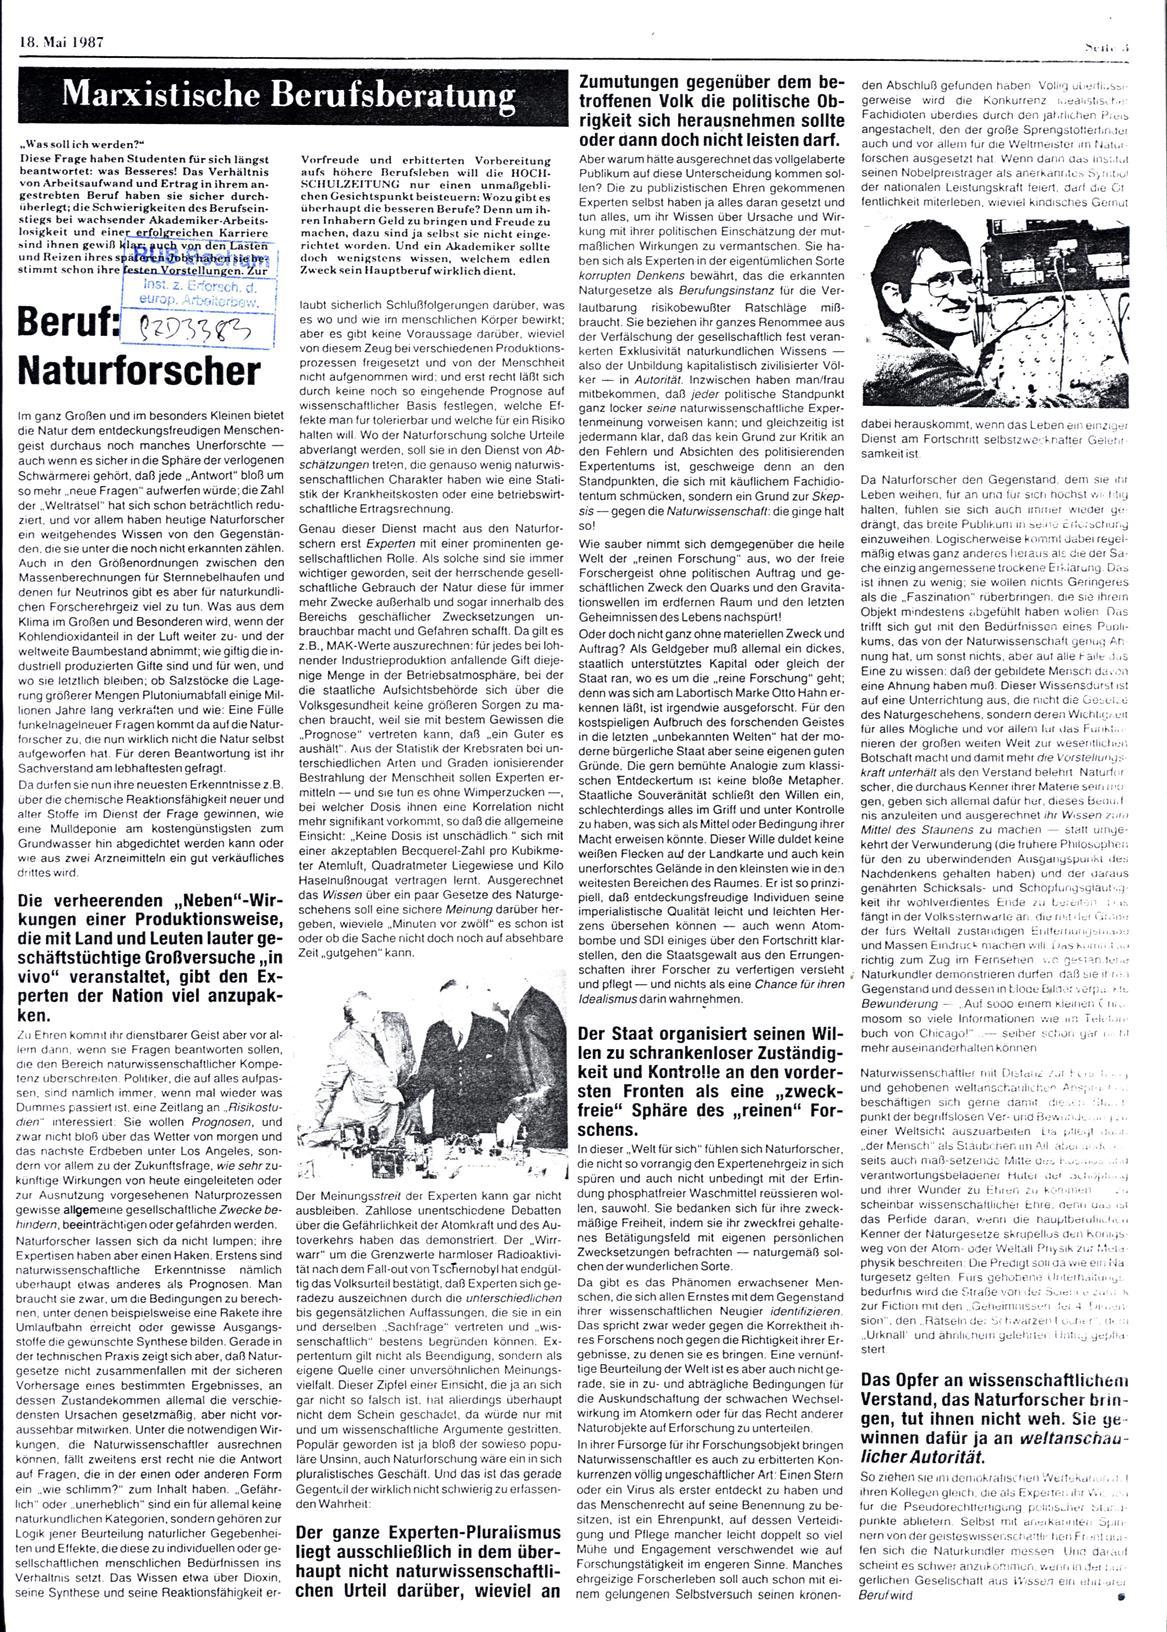 Bochum_BHZ_19870518_149_003